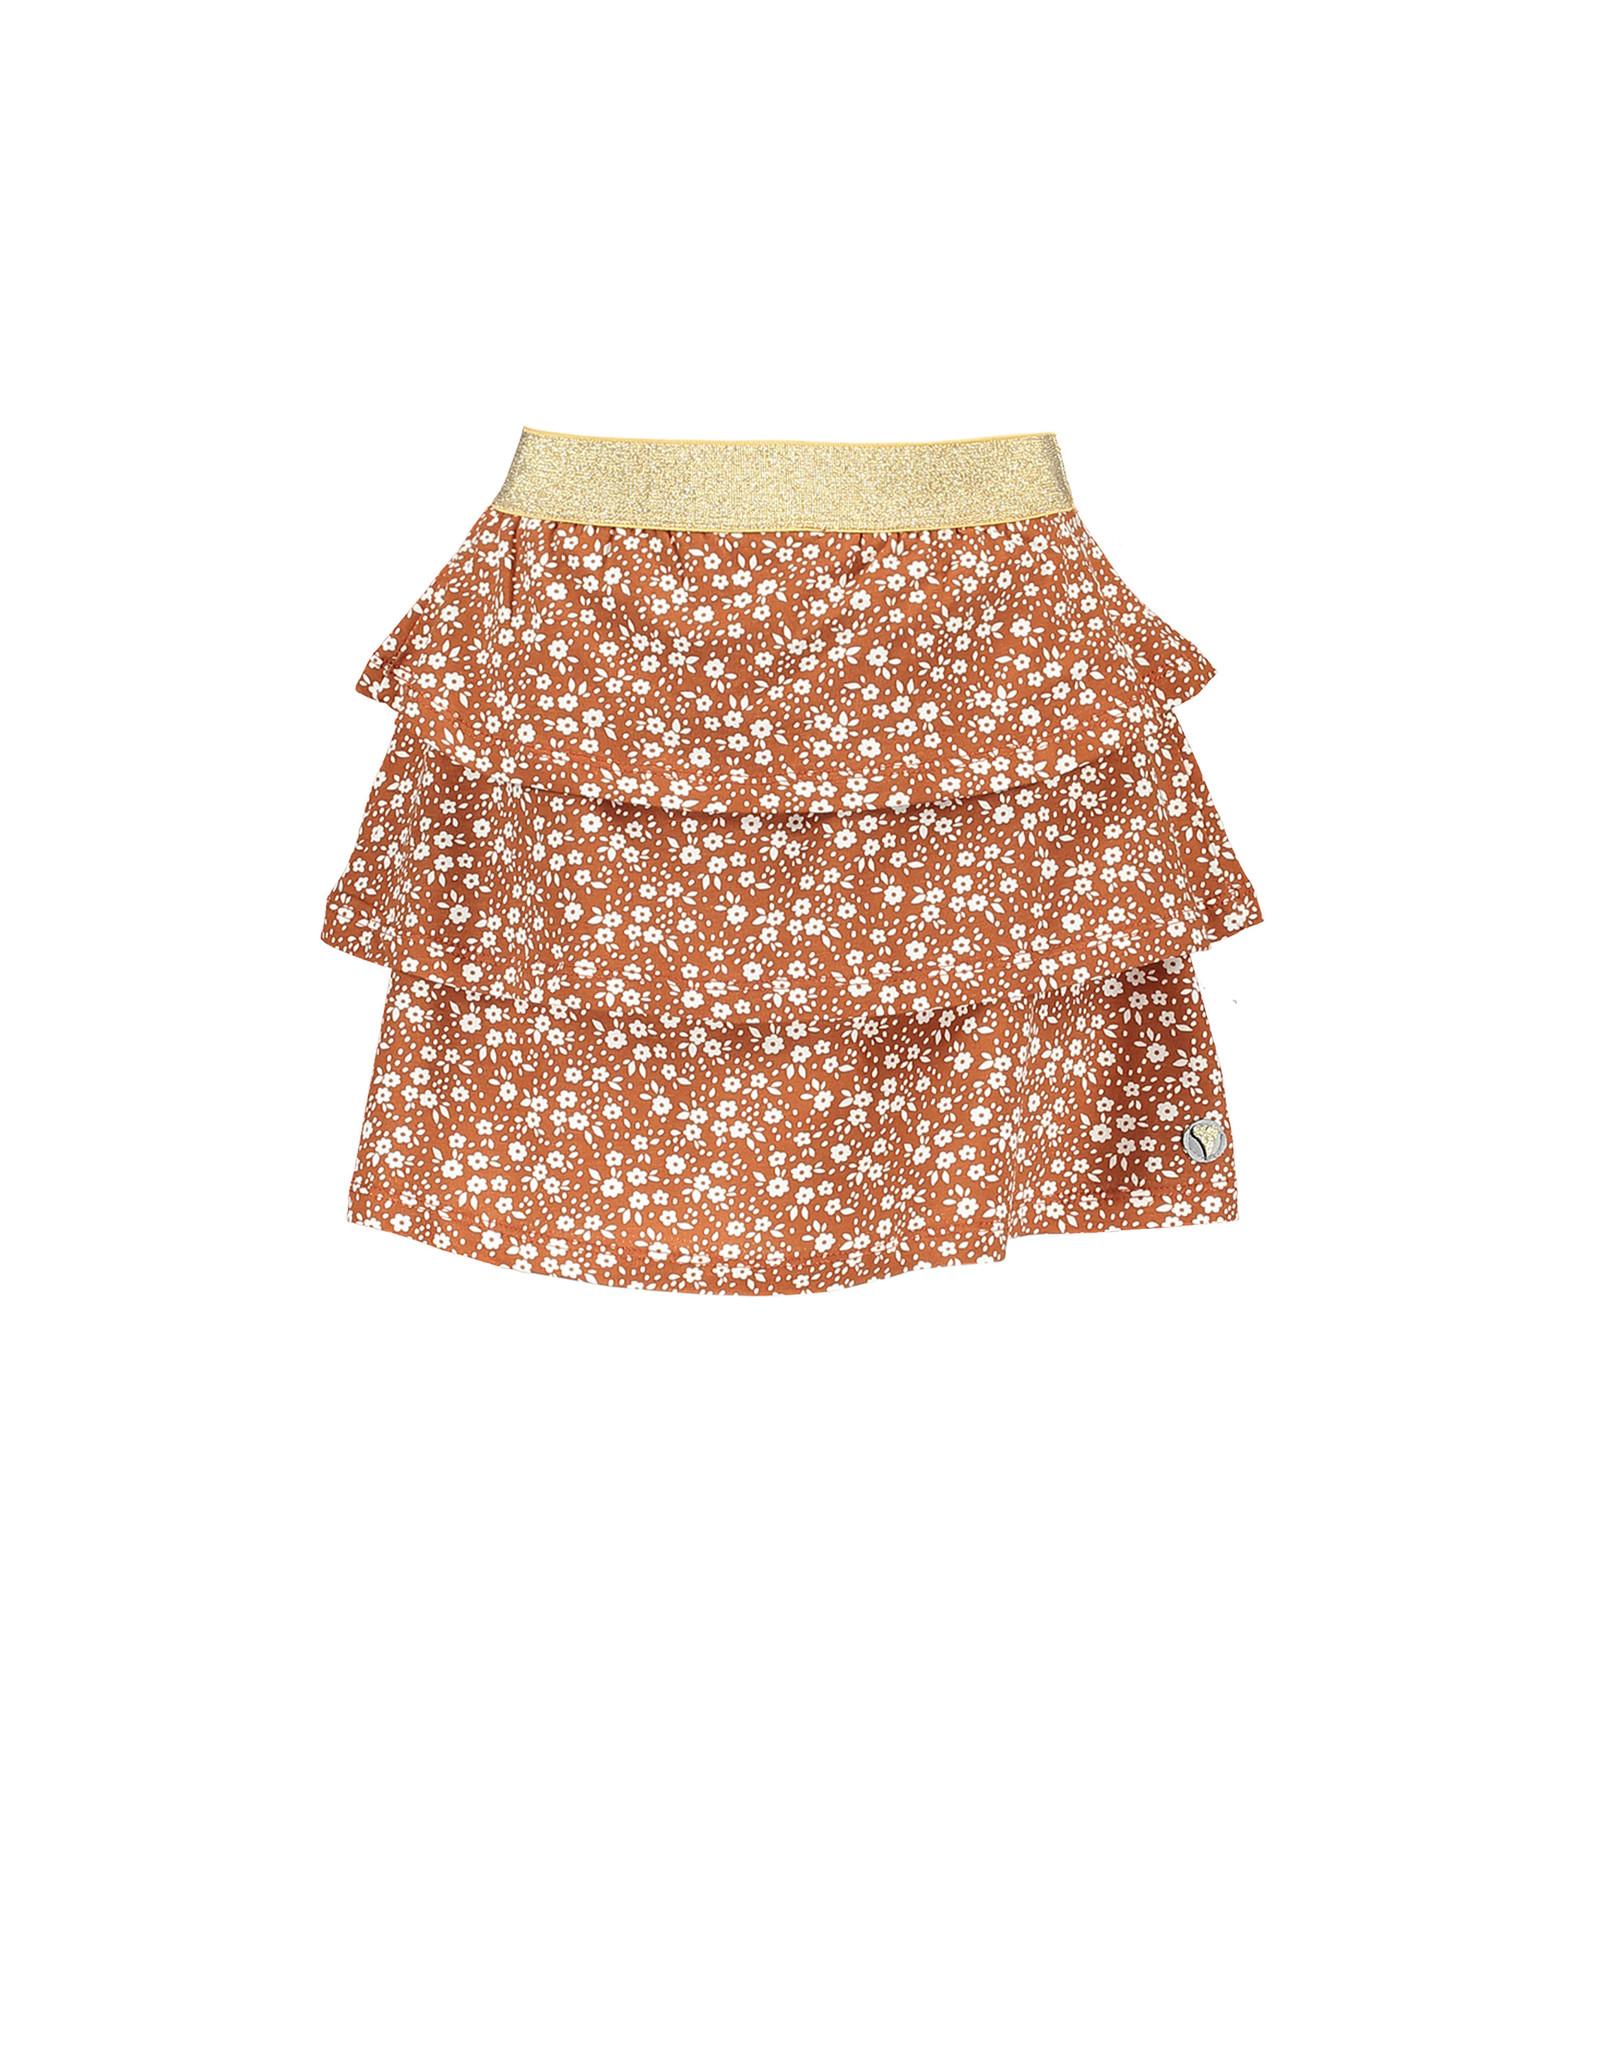 Moodstreet MT skirt with frills AO min flower, Toffee